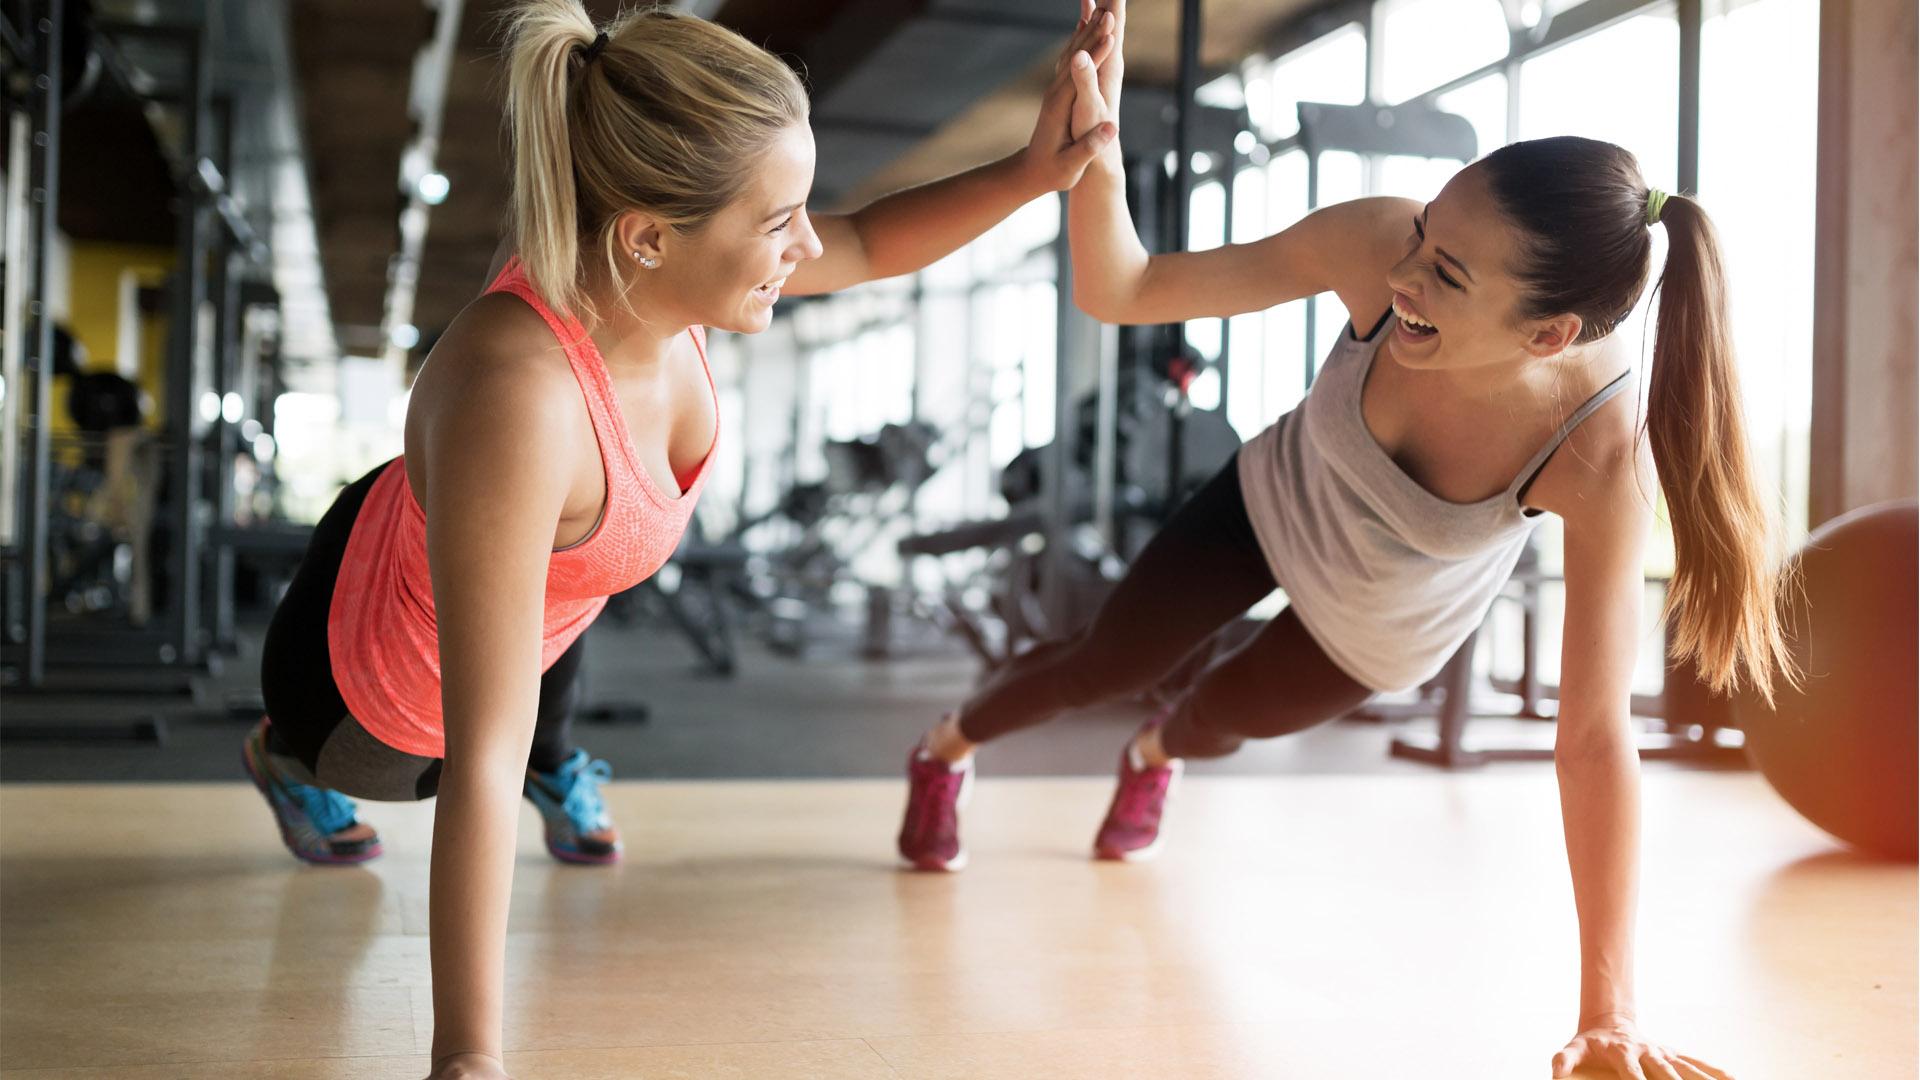 fitnesscentrum-fitup-za-kamosa-mesiac-zdarma